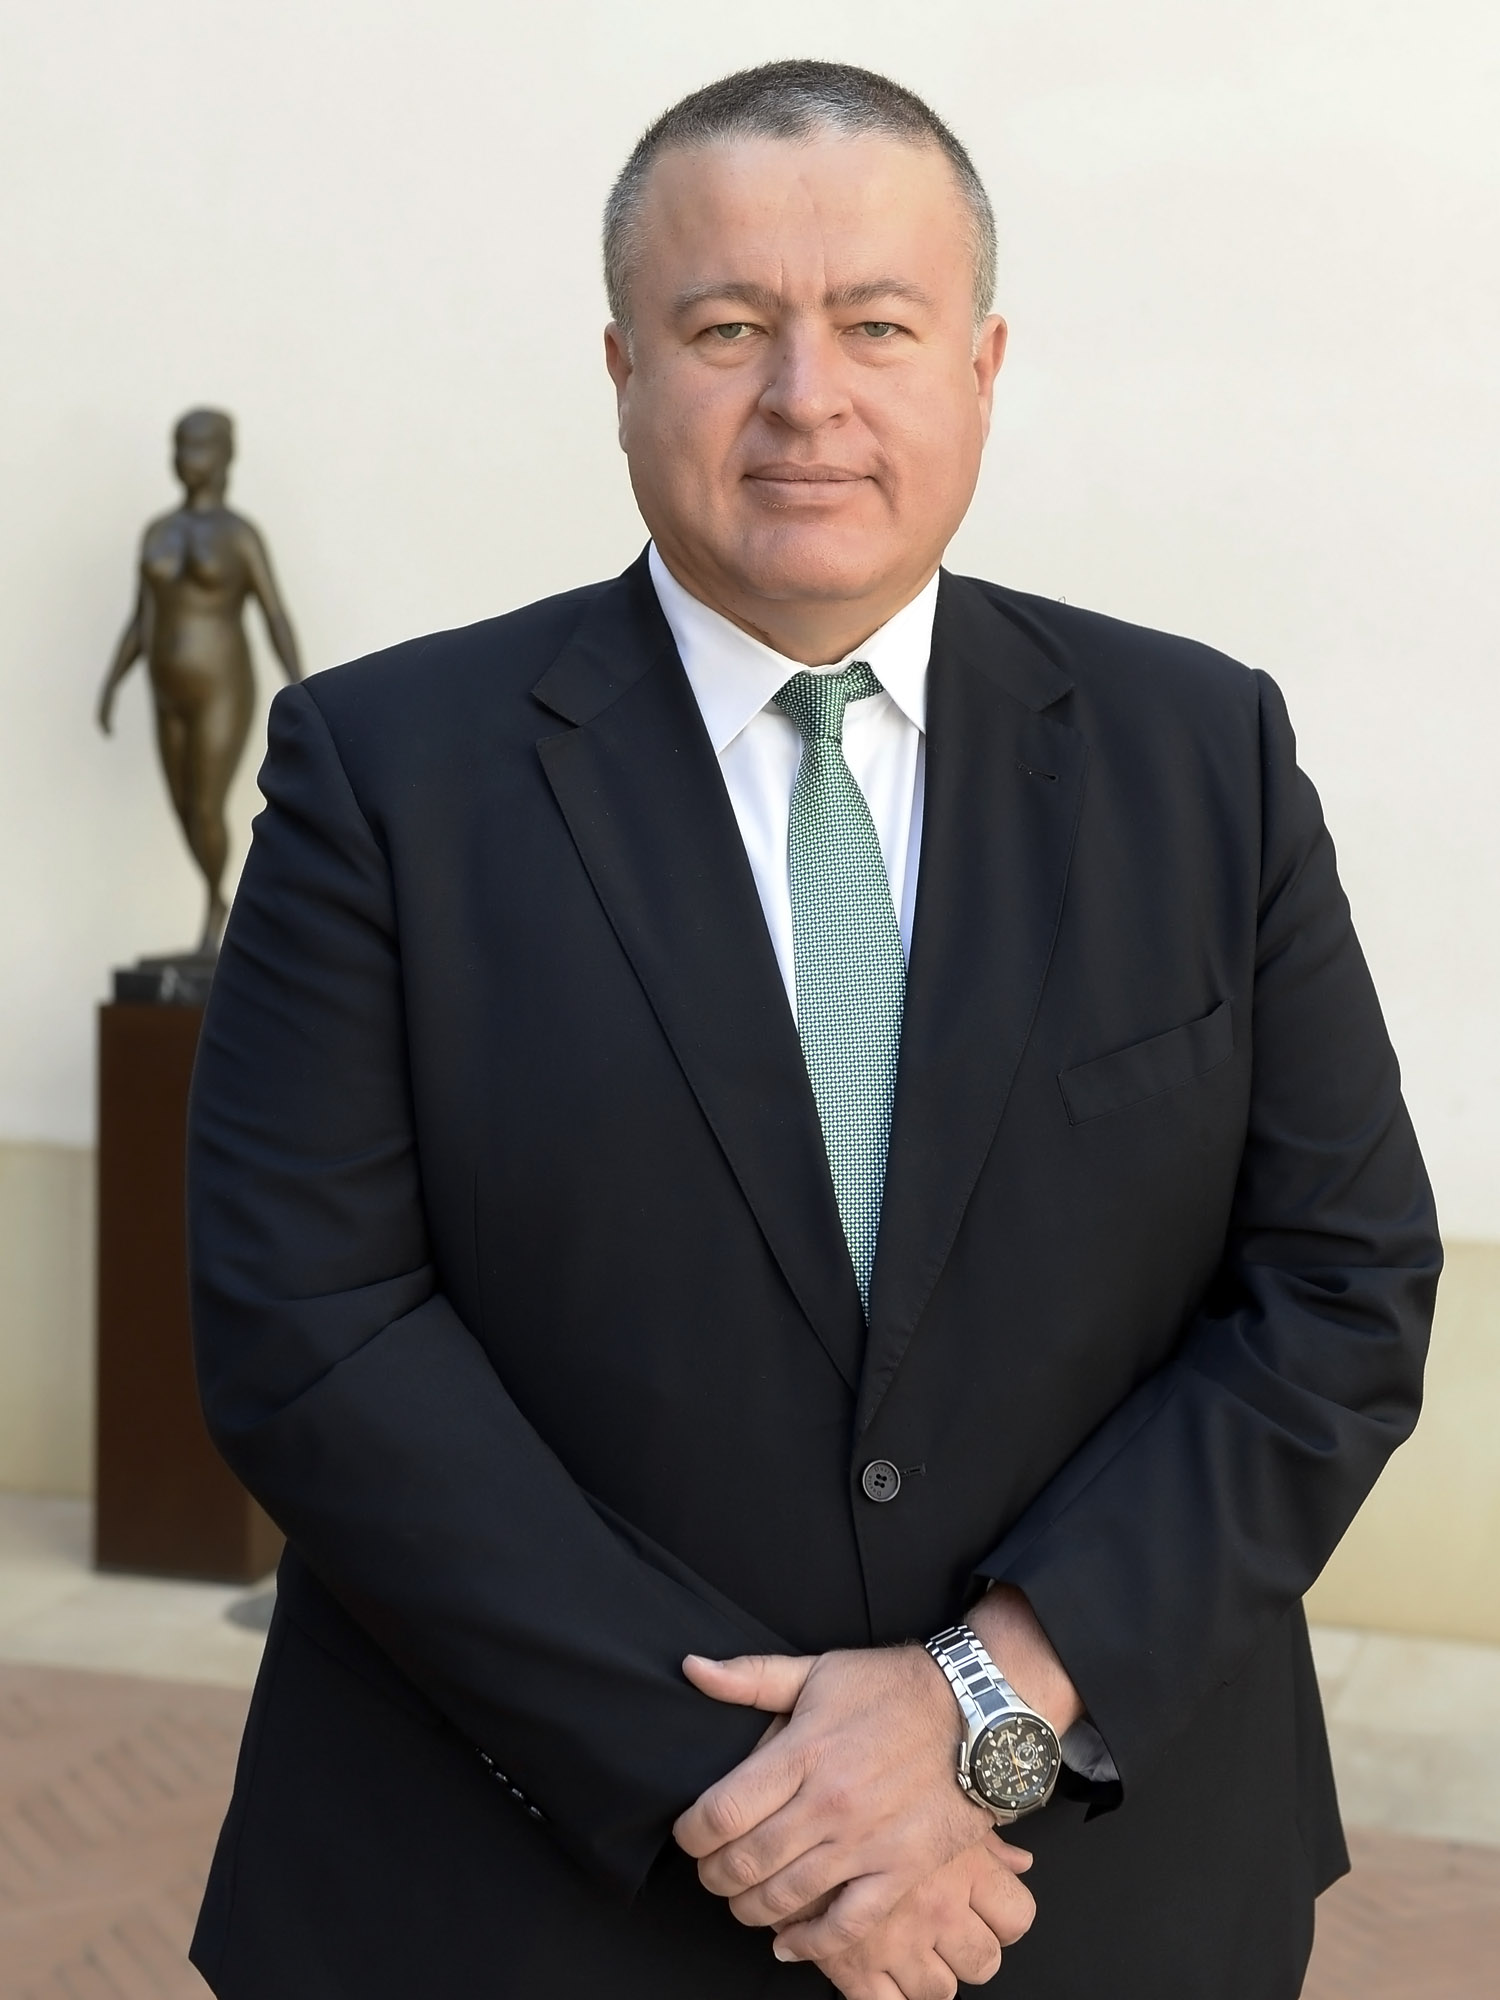 Francisco Martín Bernabé Pérez